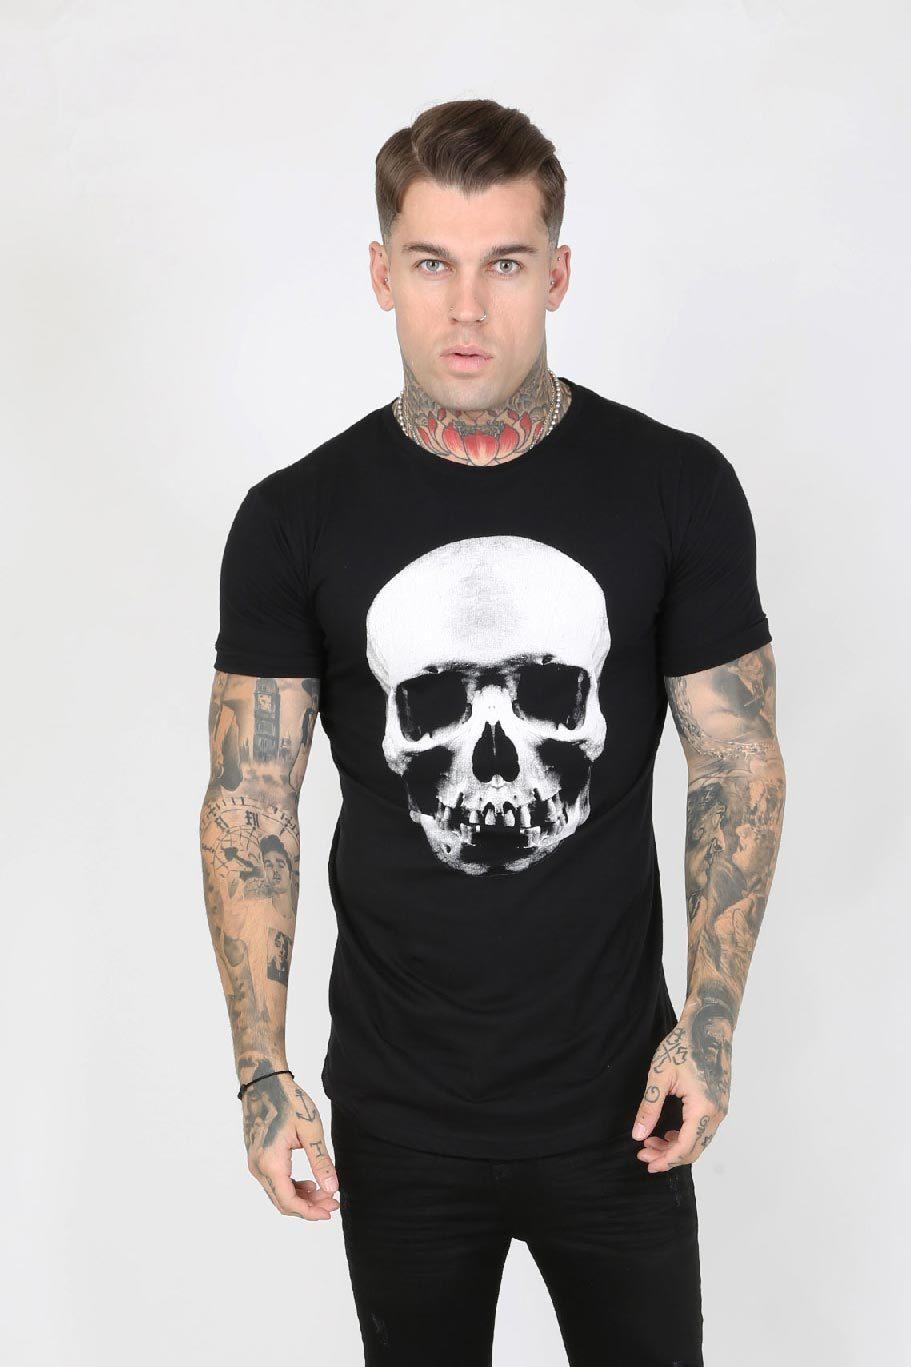 Hellz Crystal Back Logo Skull Print Men's T-Shirt - Black, Small